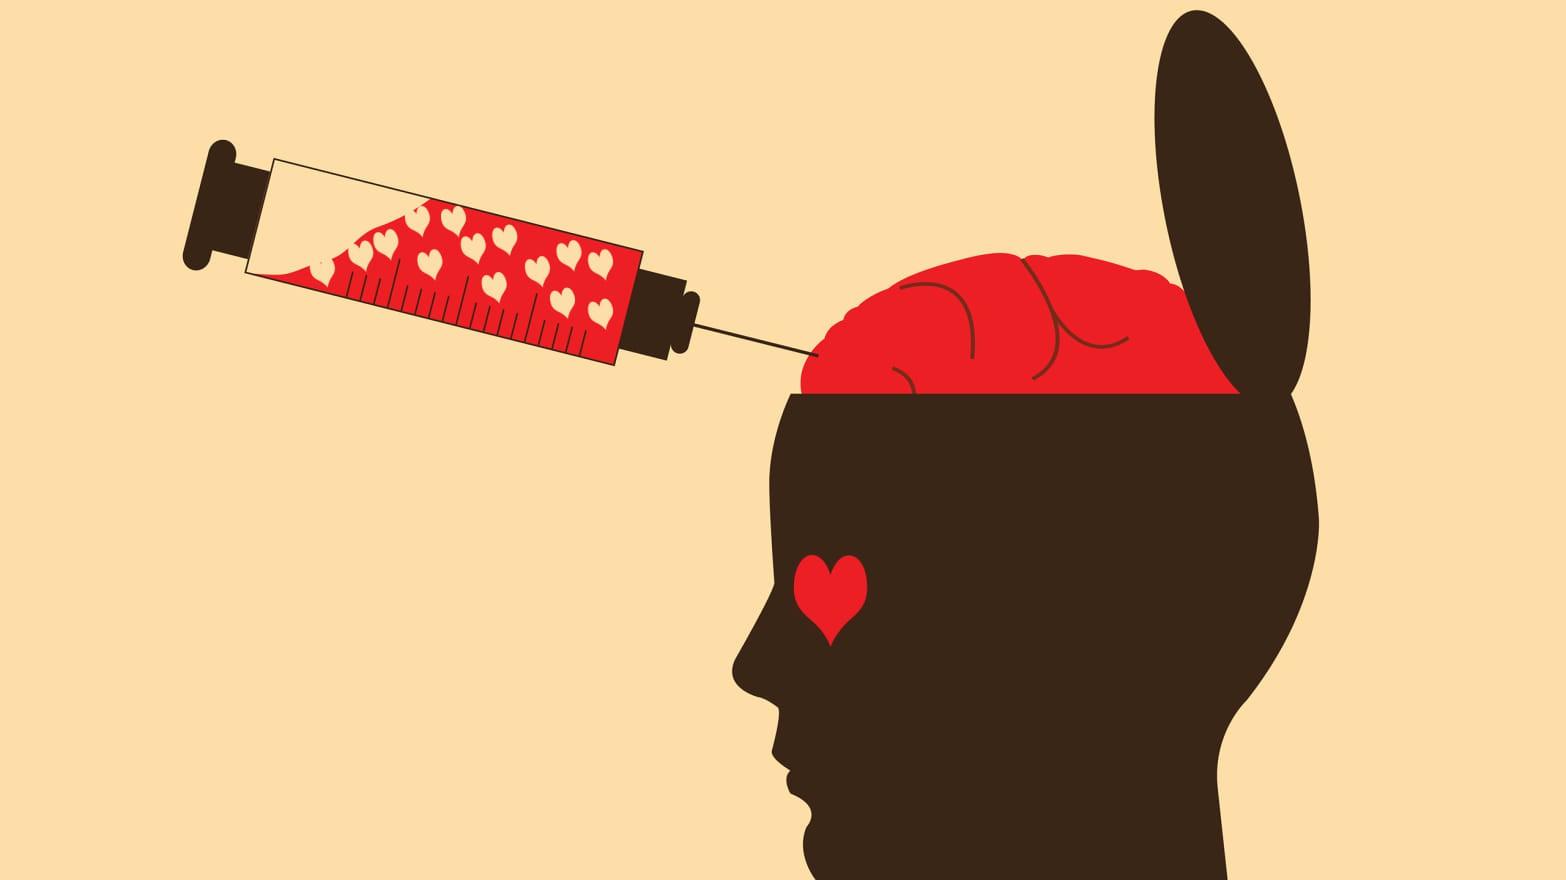 151017-siegel-brain-love-tease_swkg1r